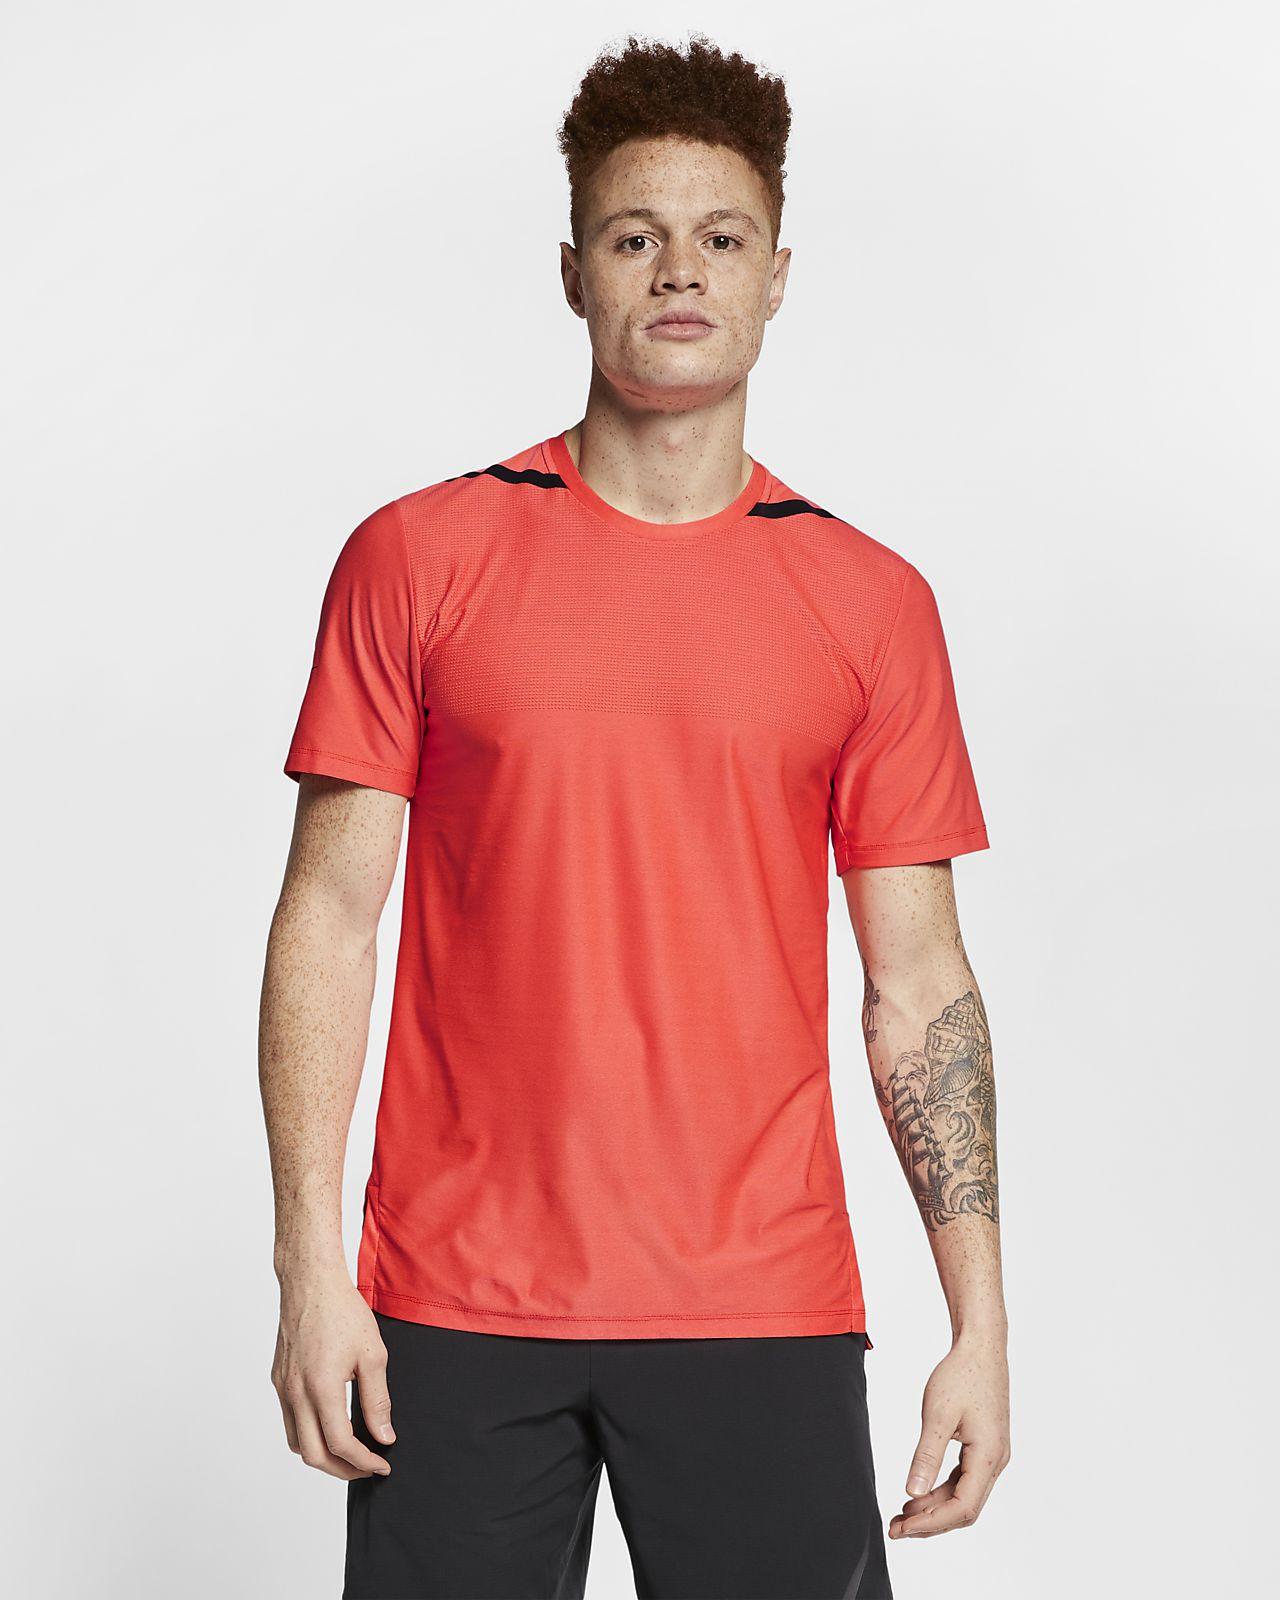 Nike Dri-FIT Tech Pack Camiseta de entrenamiento de manga corta - Hombre